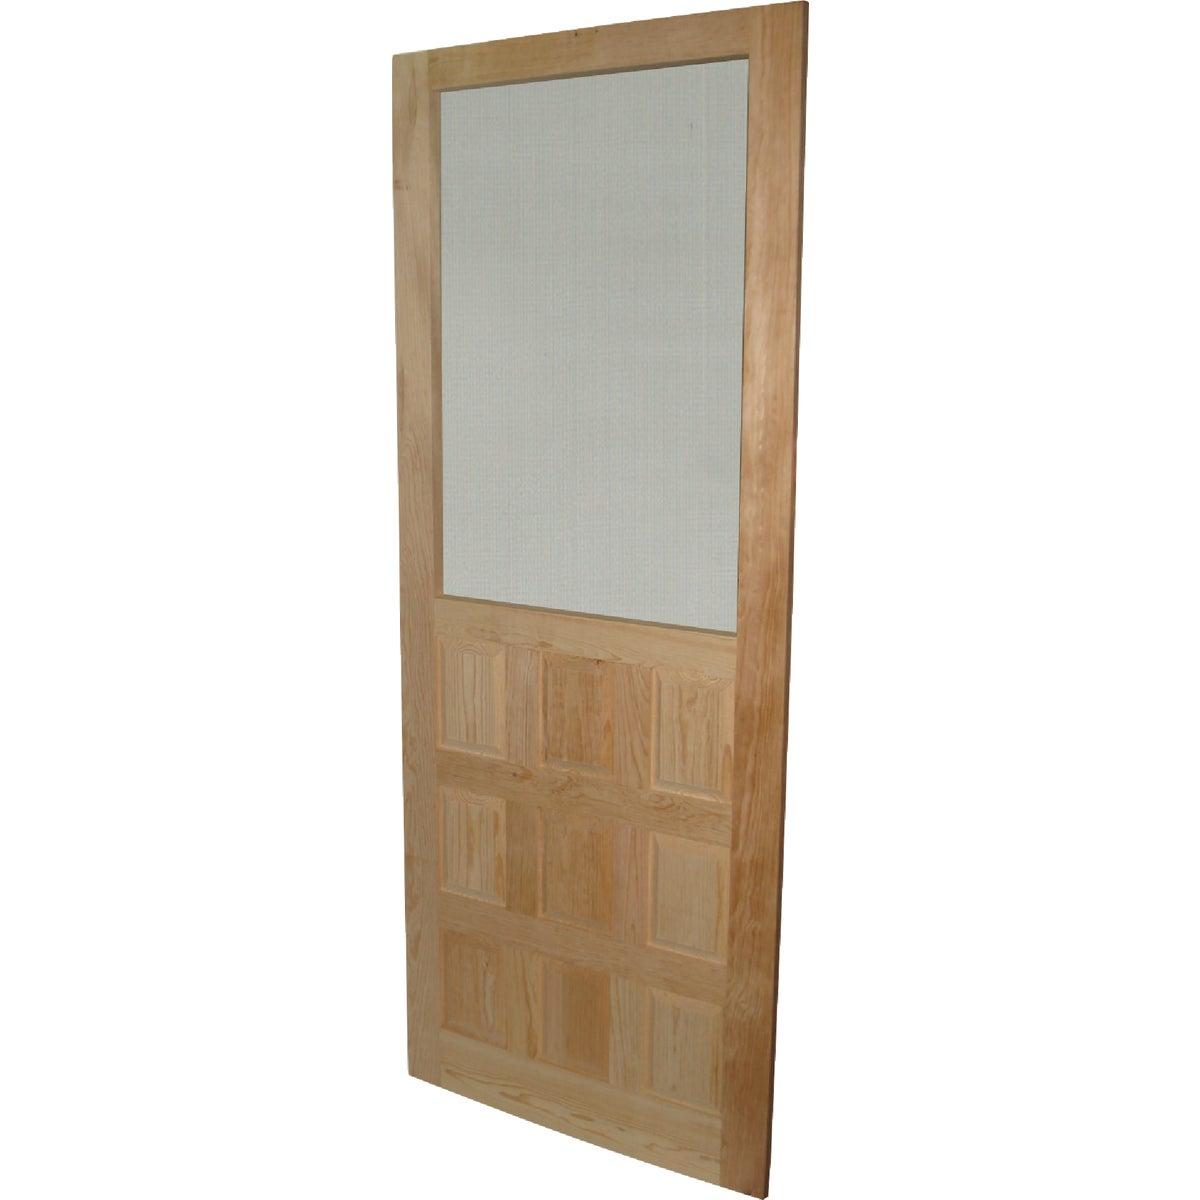 Wood Prod Manufacturers 32